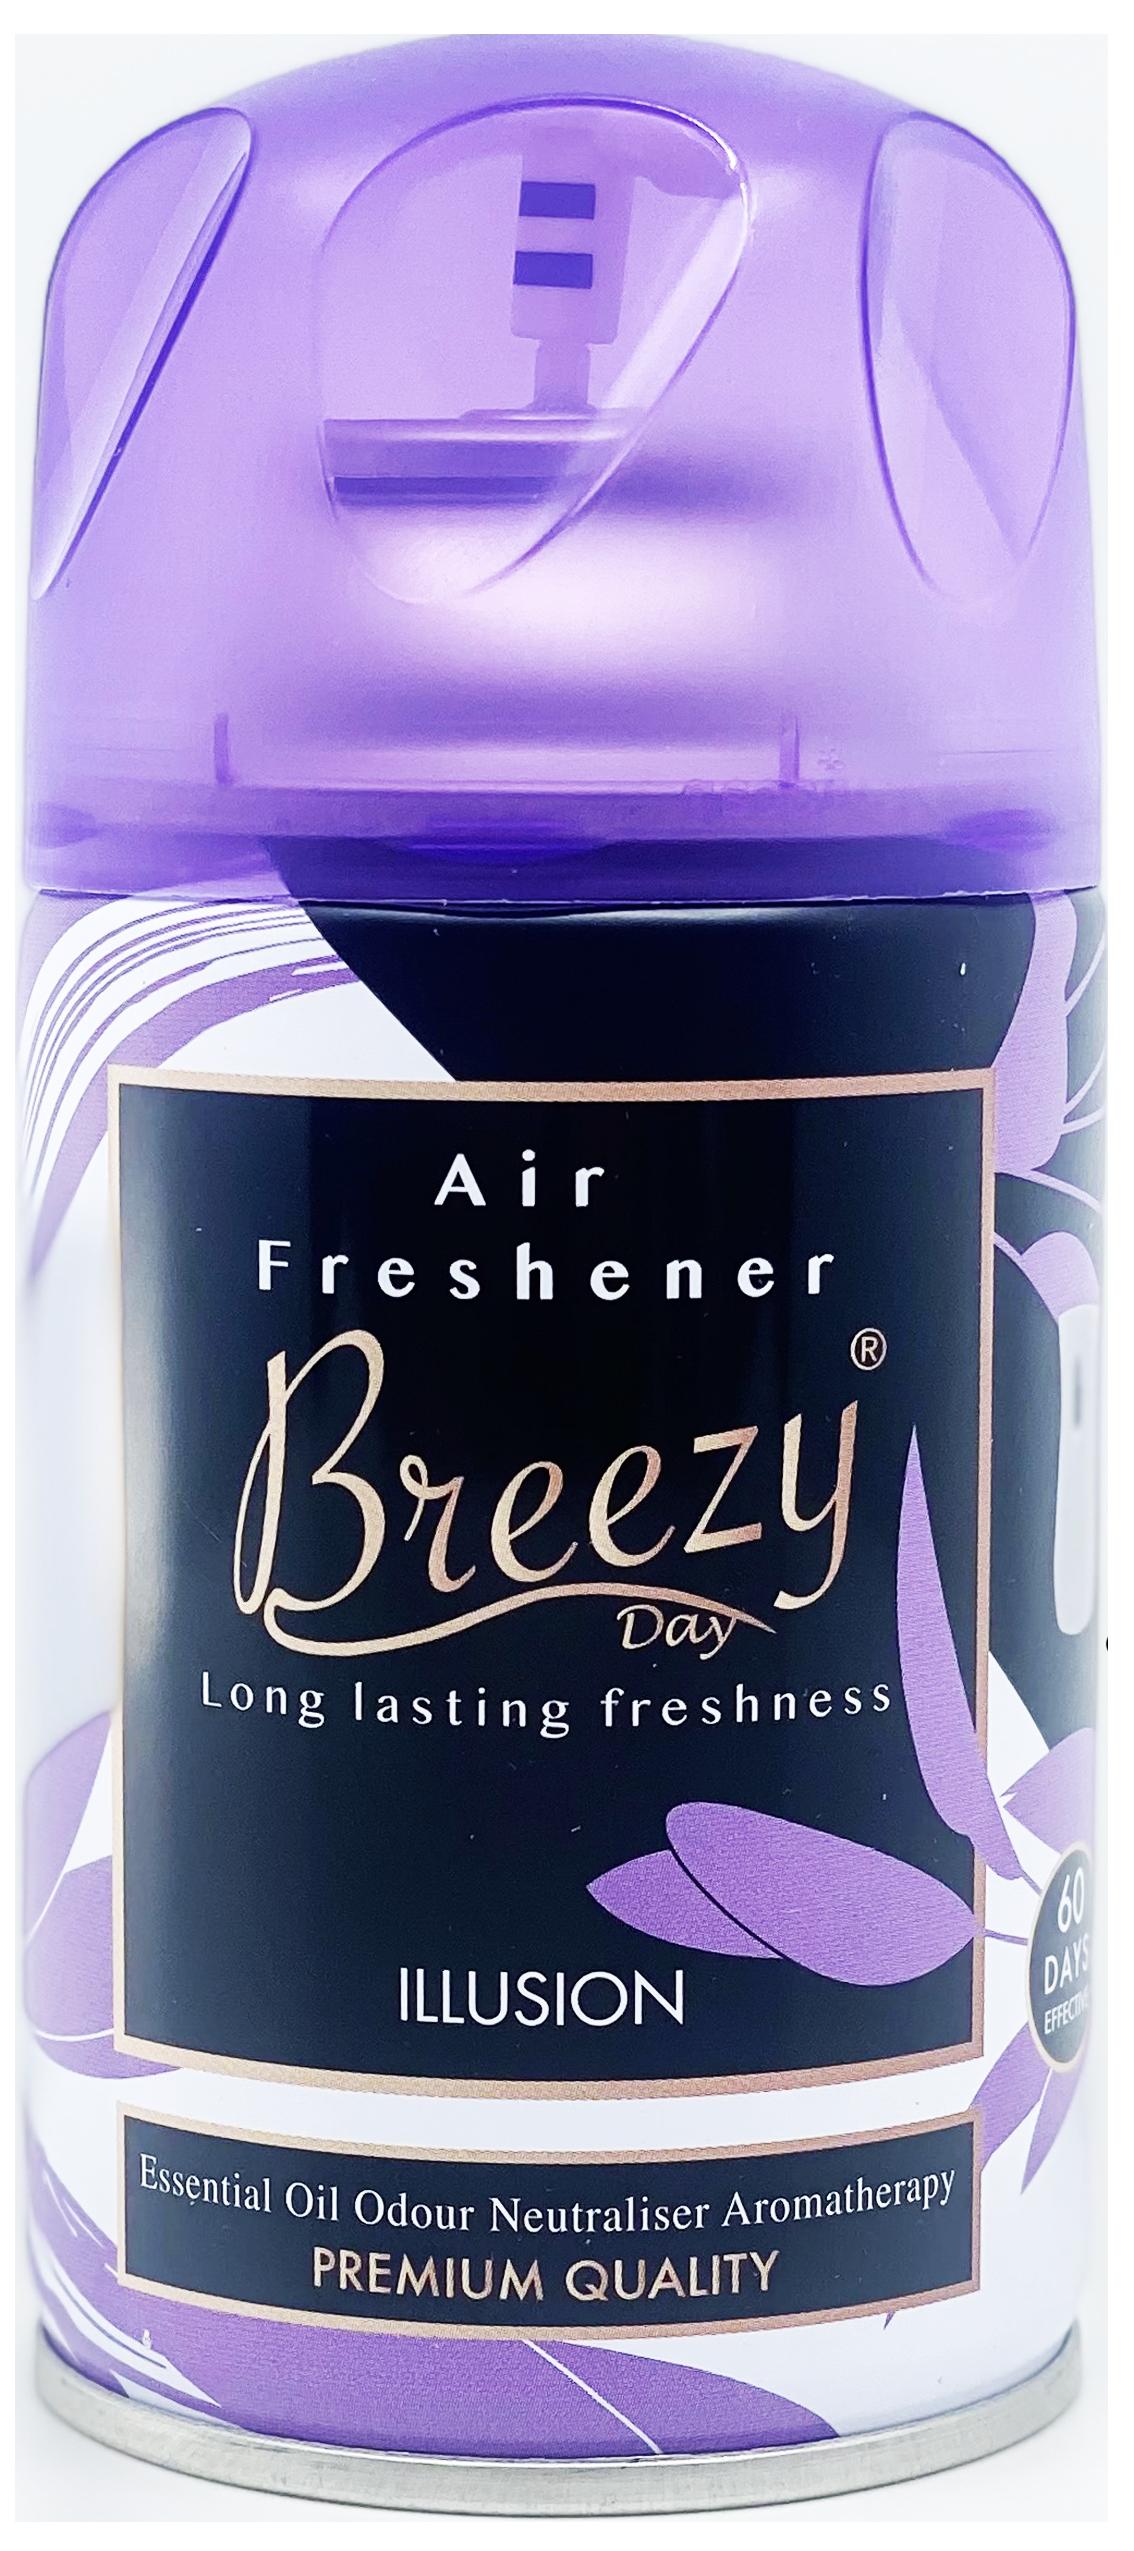 Breezy Illusion